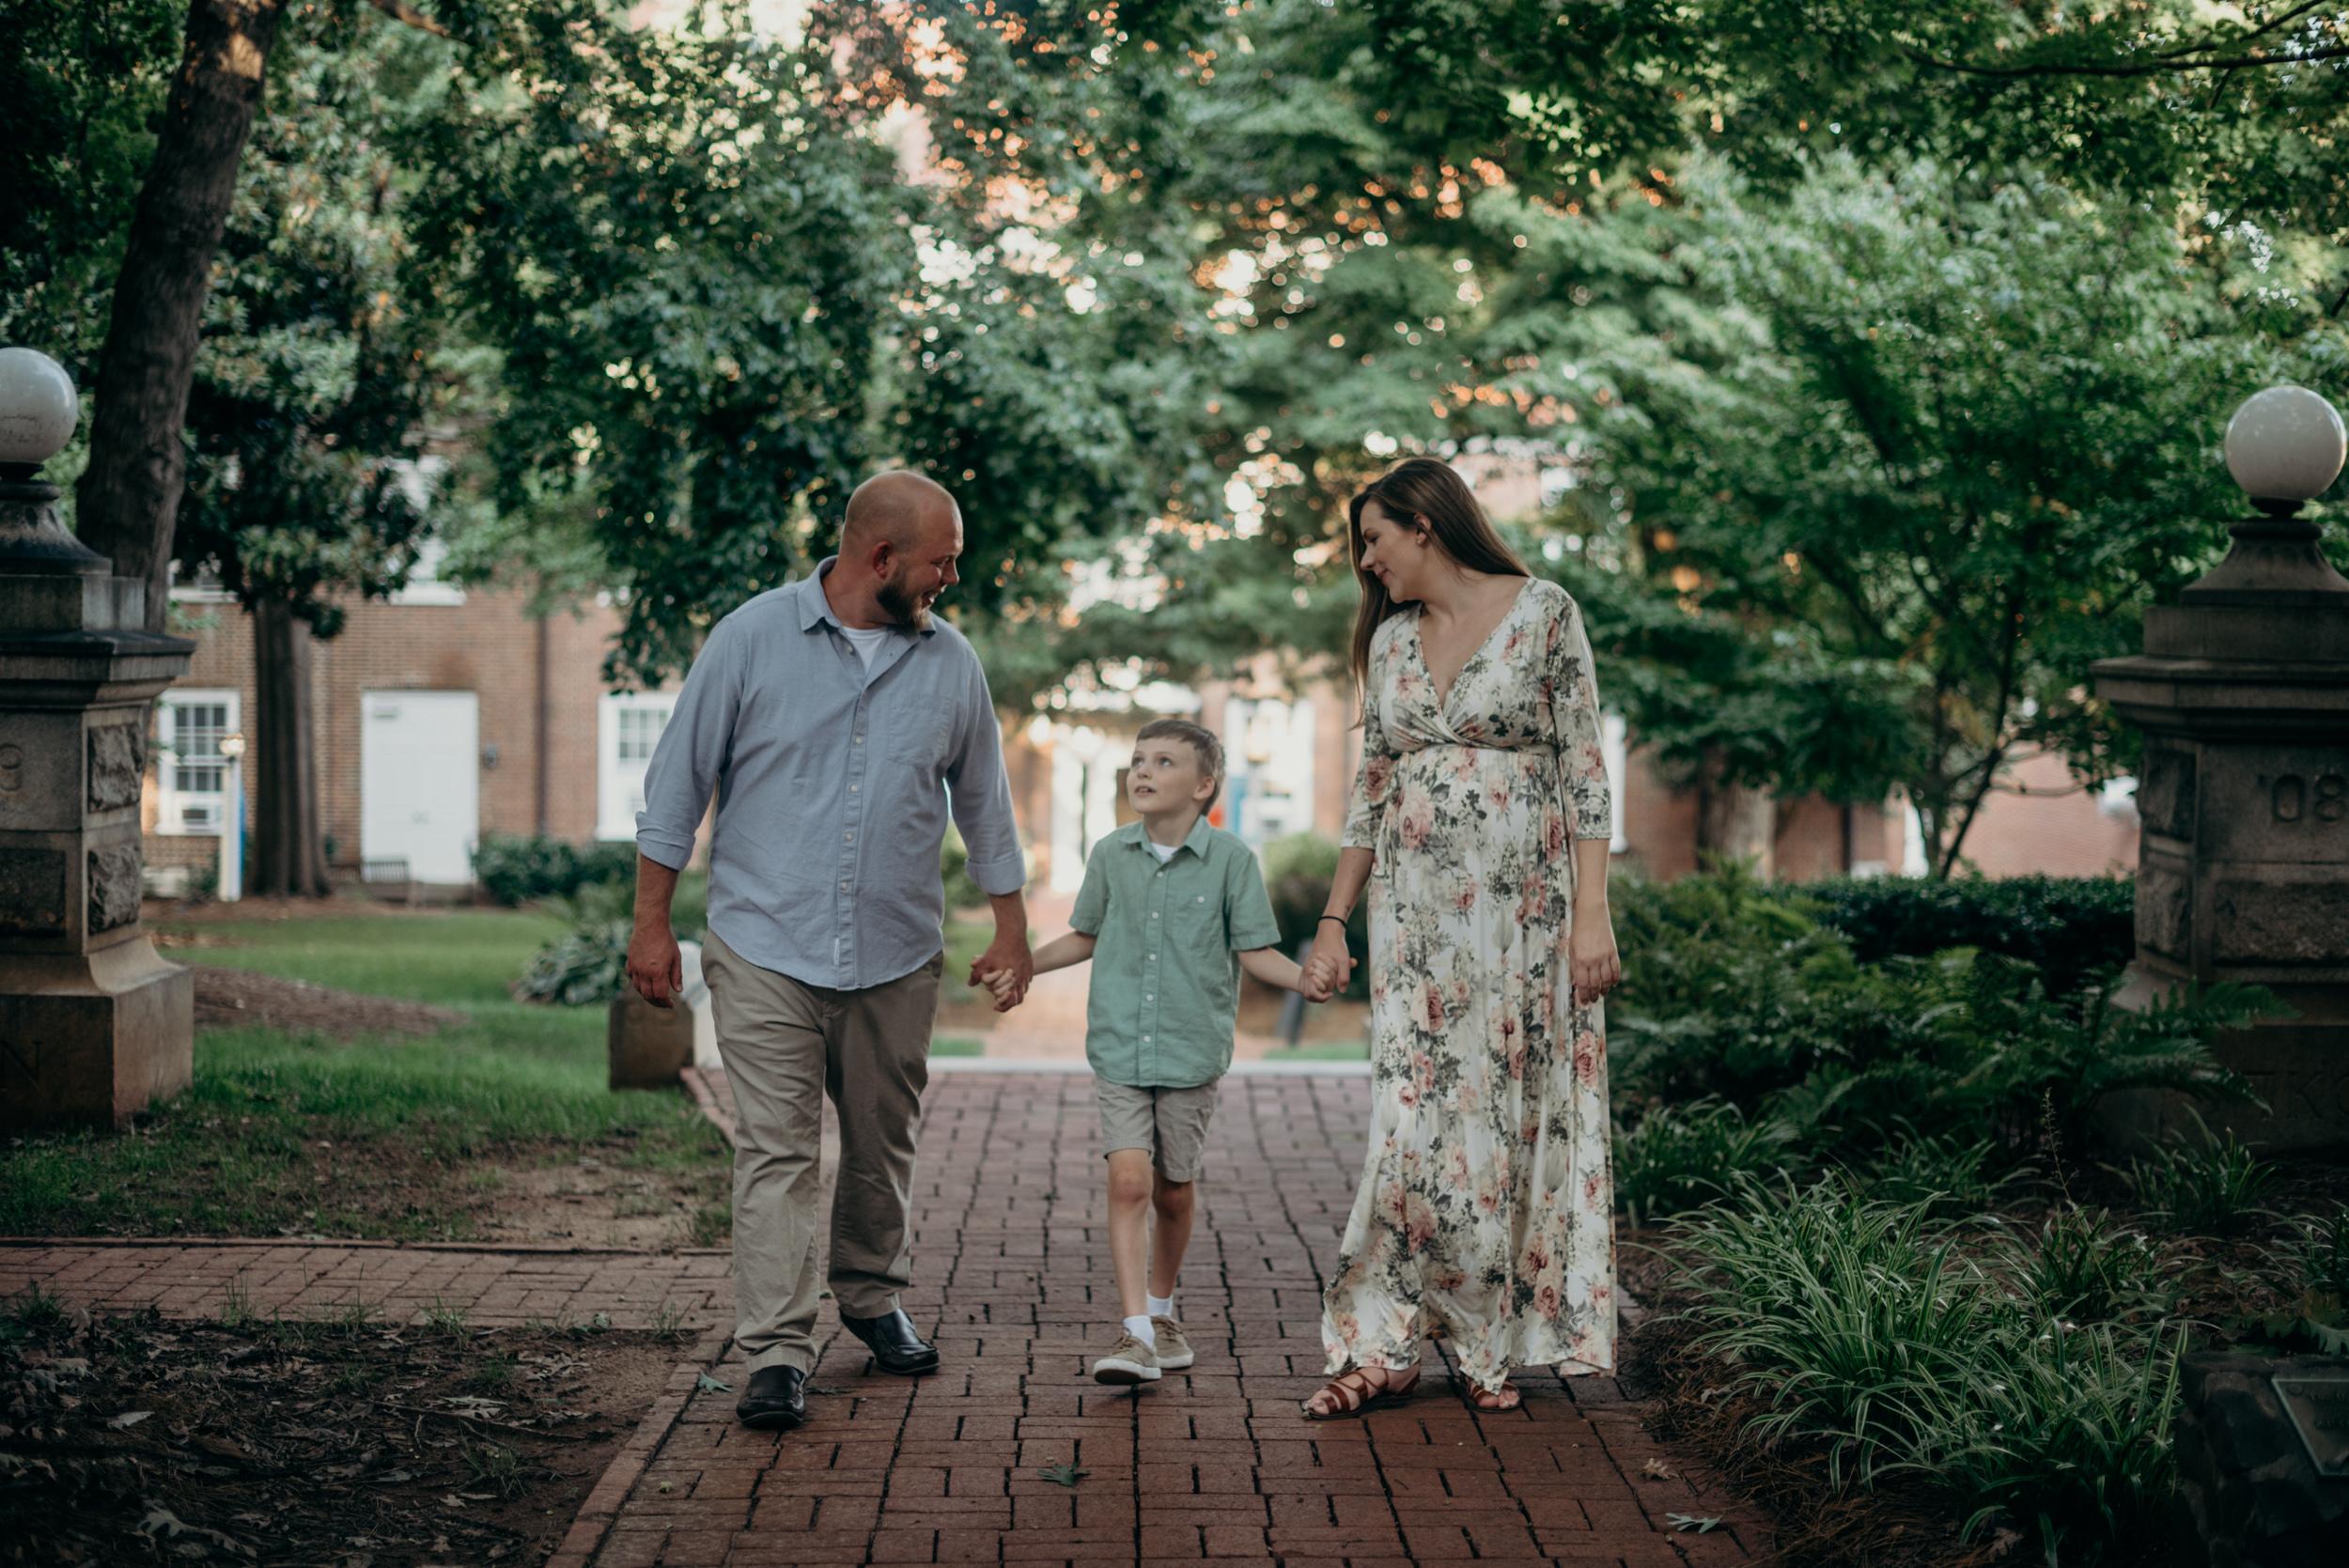 winston-salem-NC-maternity-family-photographer-old-salem-megan-graham-photography-2865.jpg